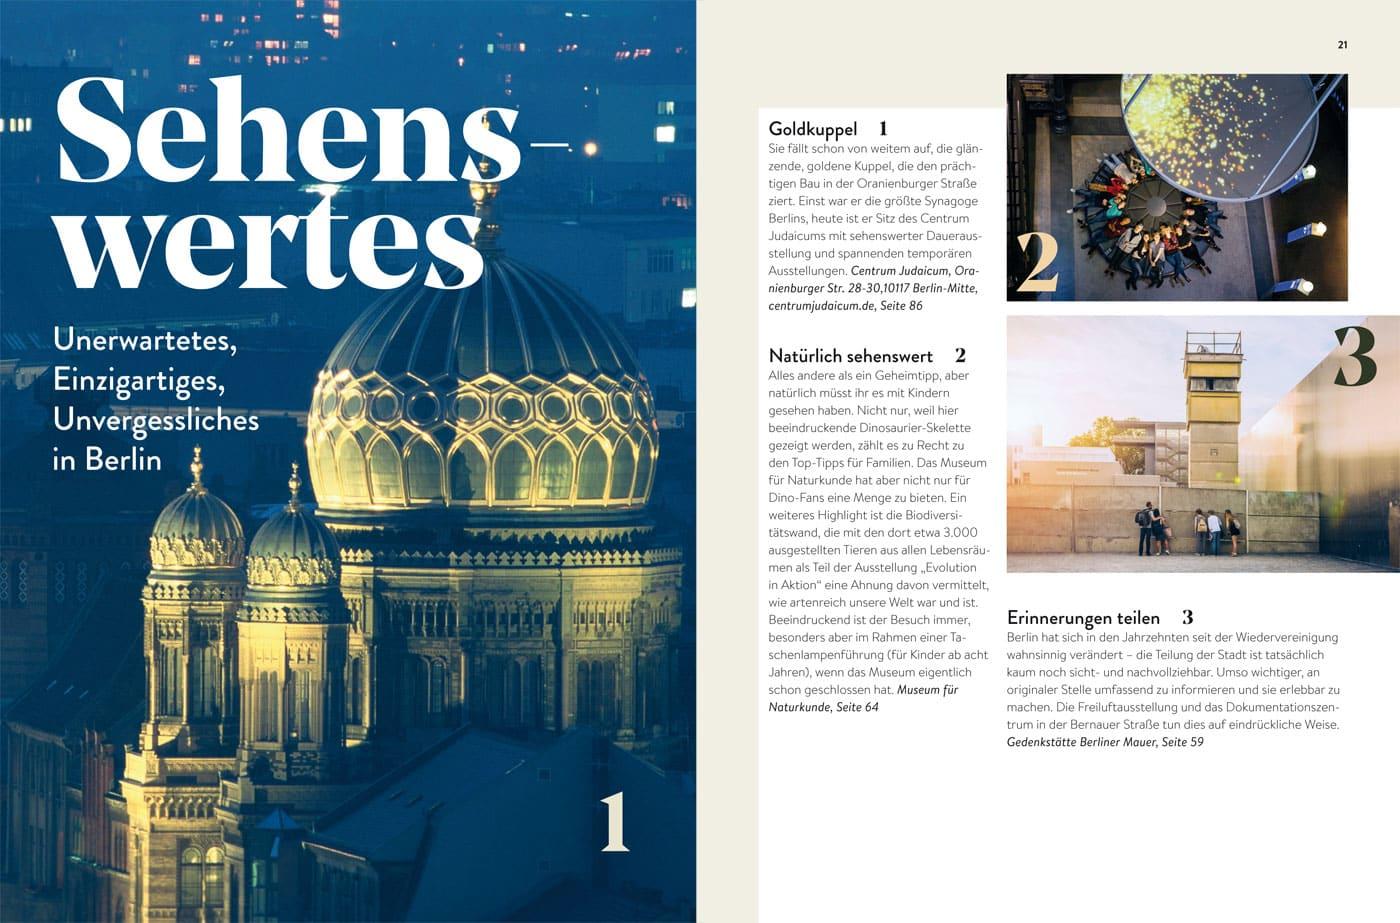 HIMBEER Buch BERLIN MIT KIND 2021: Sehenswürdigkeiten in Berlin für Familien // HIMBEER